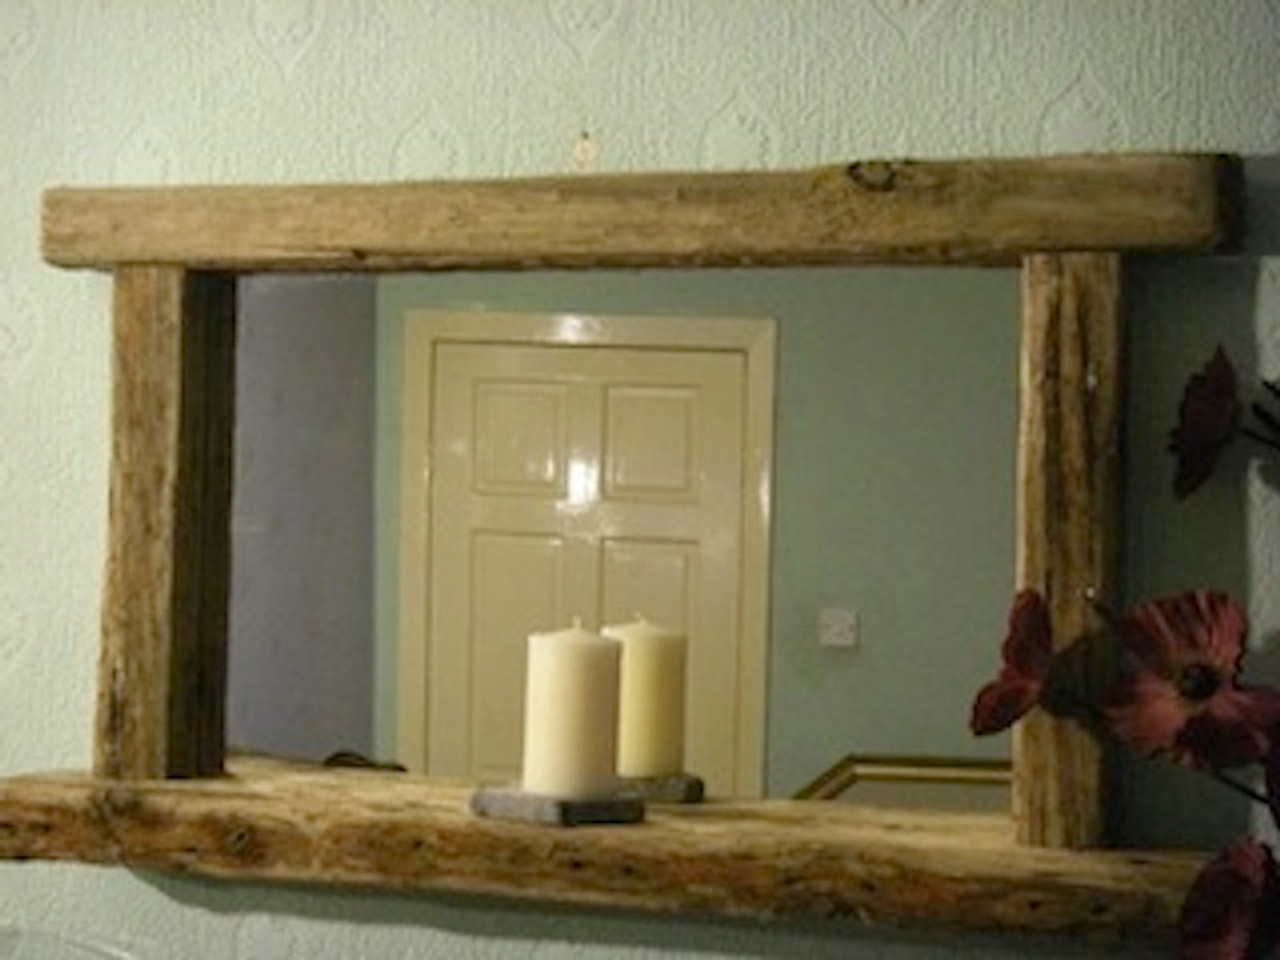 Fresh rustic reclaimed driftwood framed mirror with shelf ZZ21